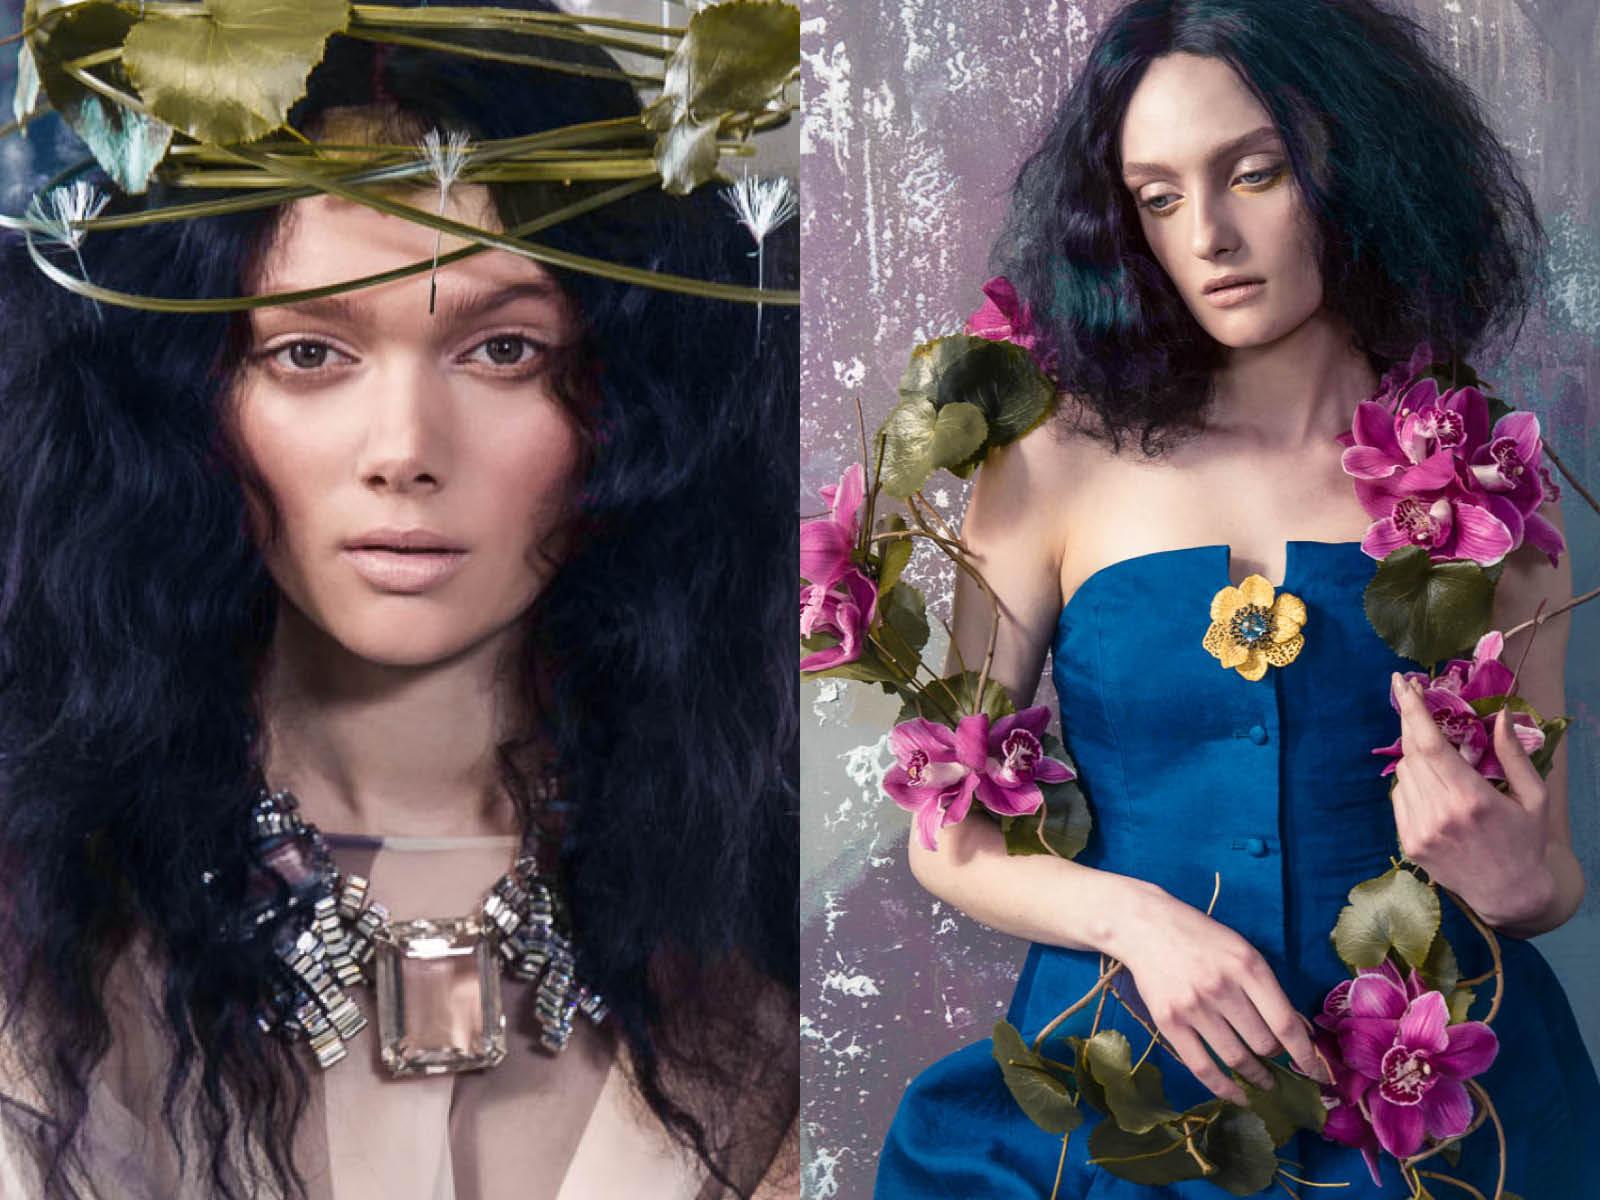 Spirit-&-FLesh-Magazine_Contarsy+Karecha_flower-girls_2